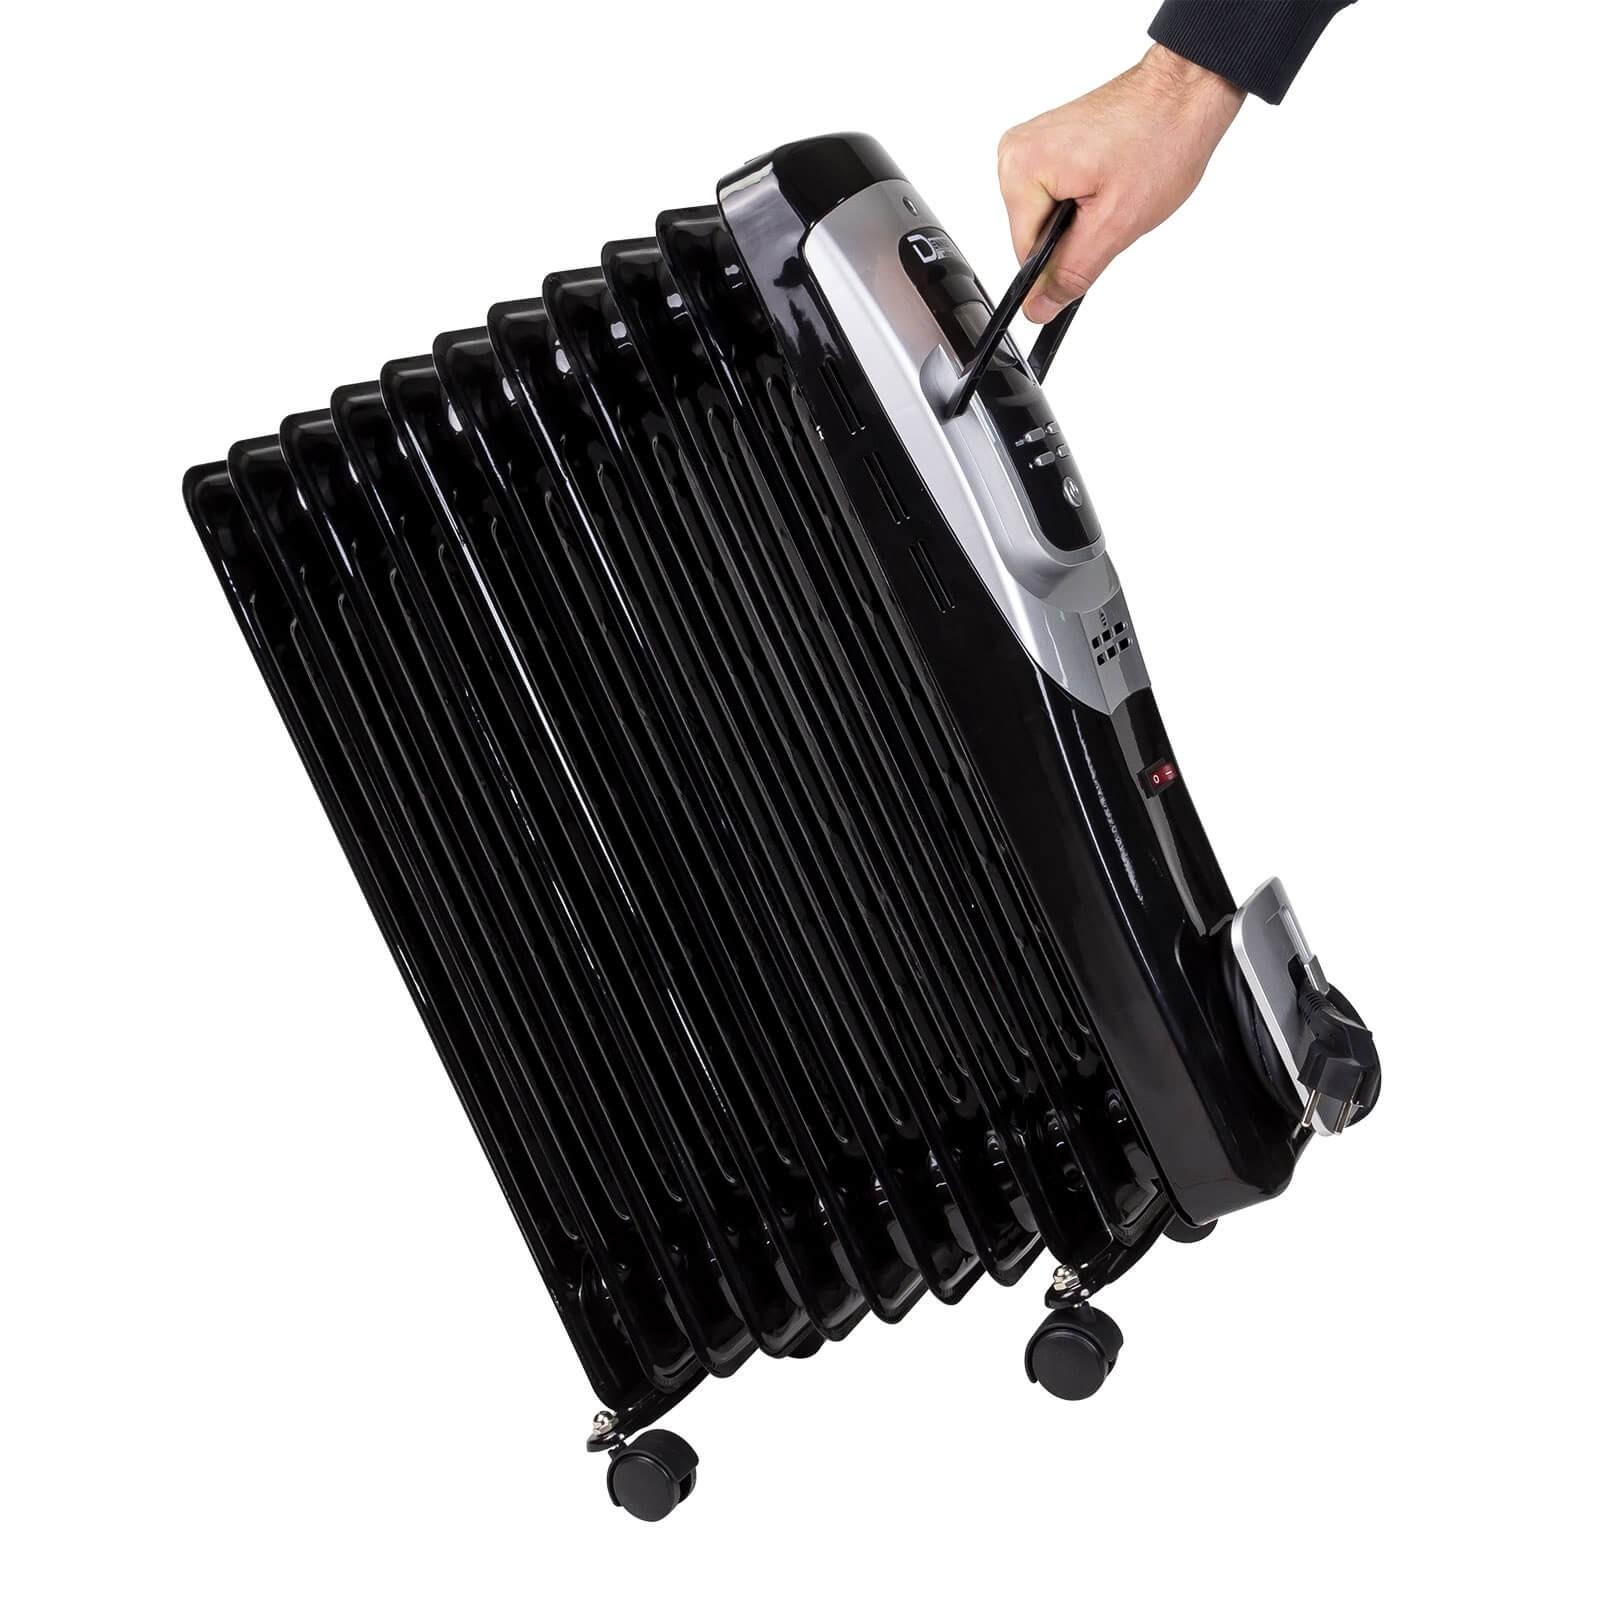 lradiator elektroheizung elektroheizk rper heizk rper heizer 11 rippen 2500 w ebay. Black Bedroom Furniture Sets. Home Design Ideas